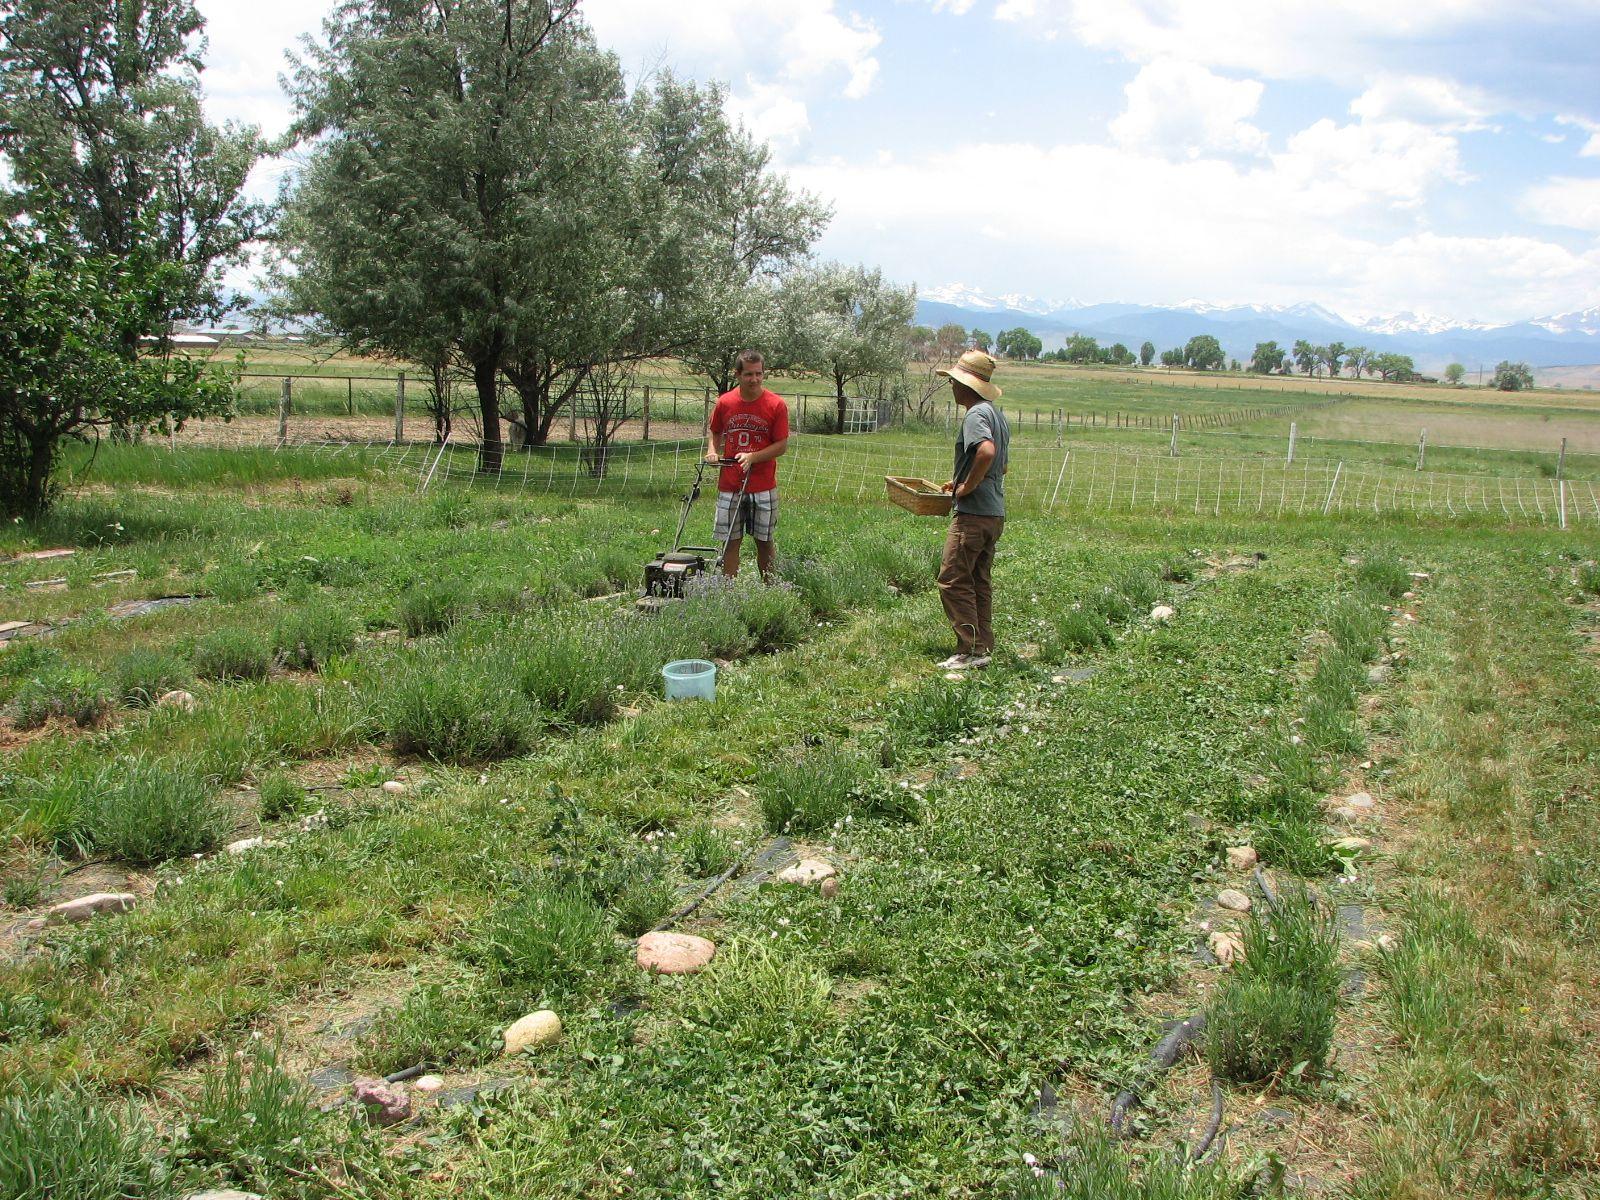 Pin on Farming/Gardening